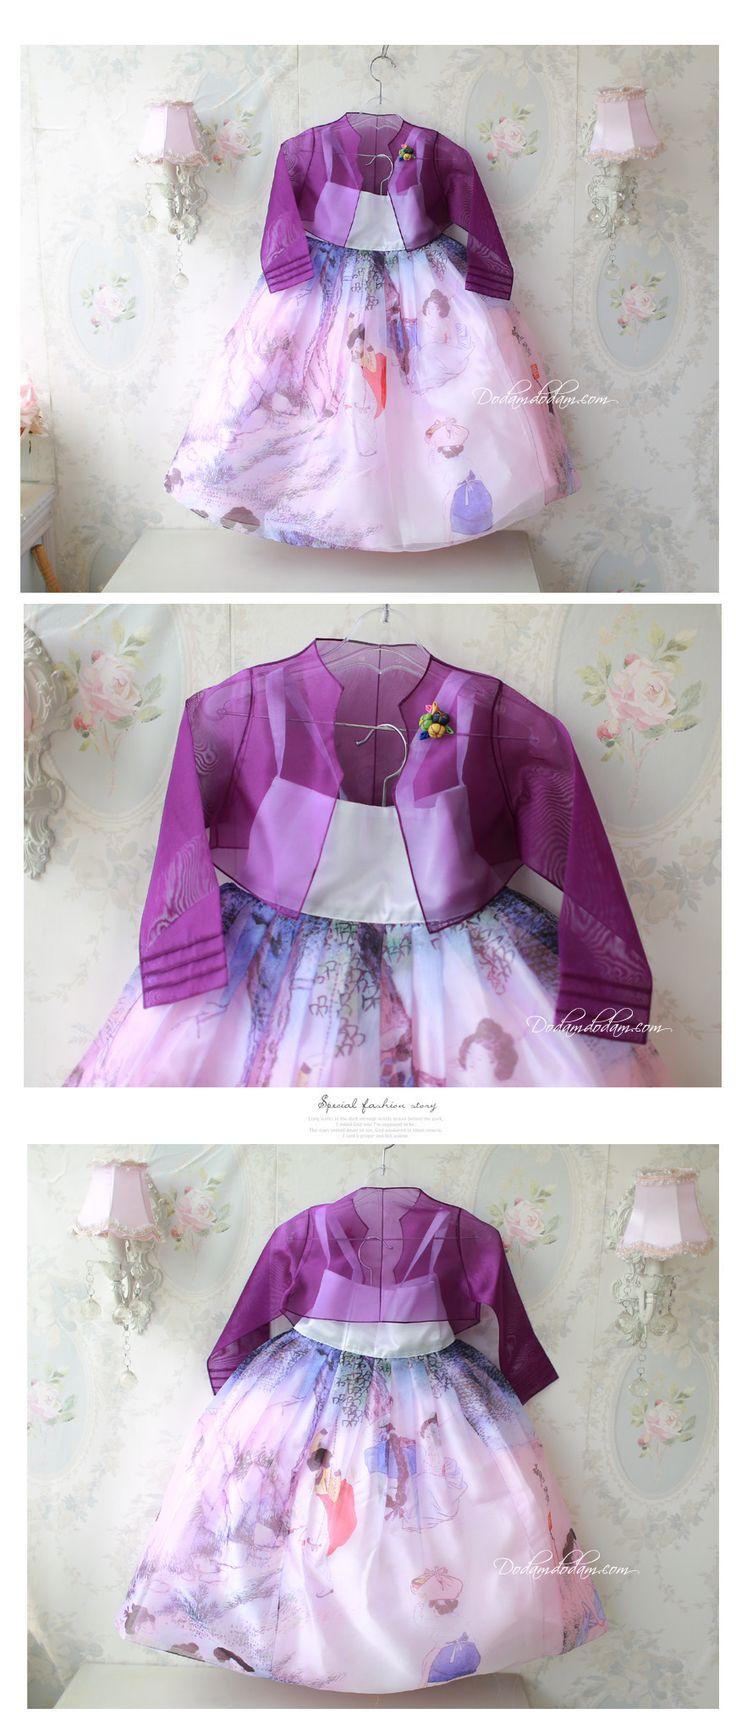 Folk fusion hanbok  W220,000 http://dodamdodam.com/goods_detail.php?goodsIdx=3810